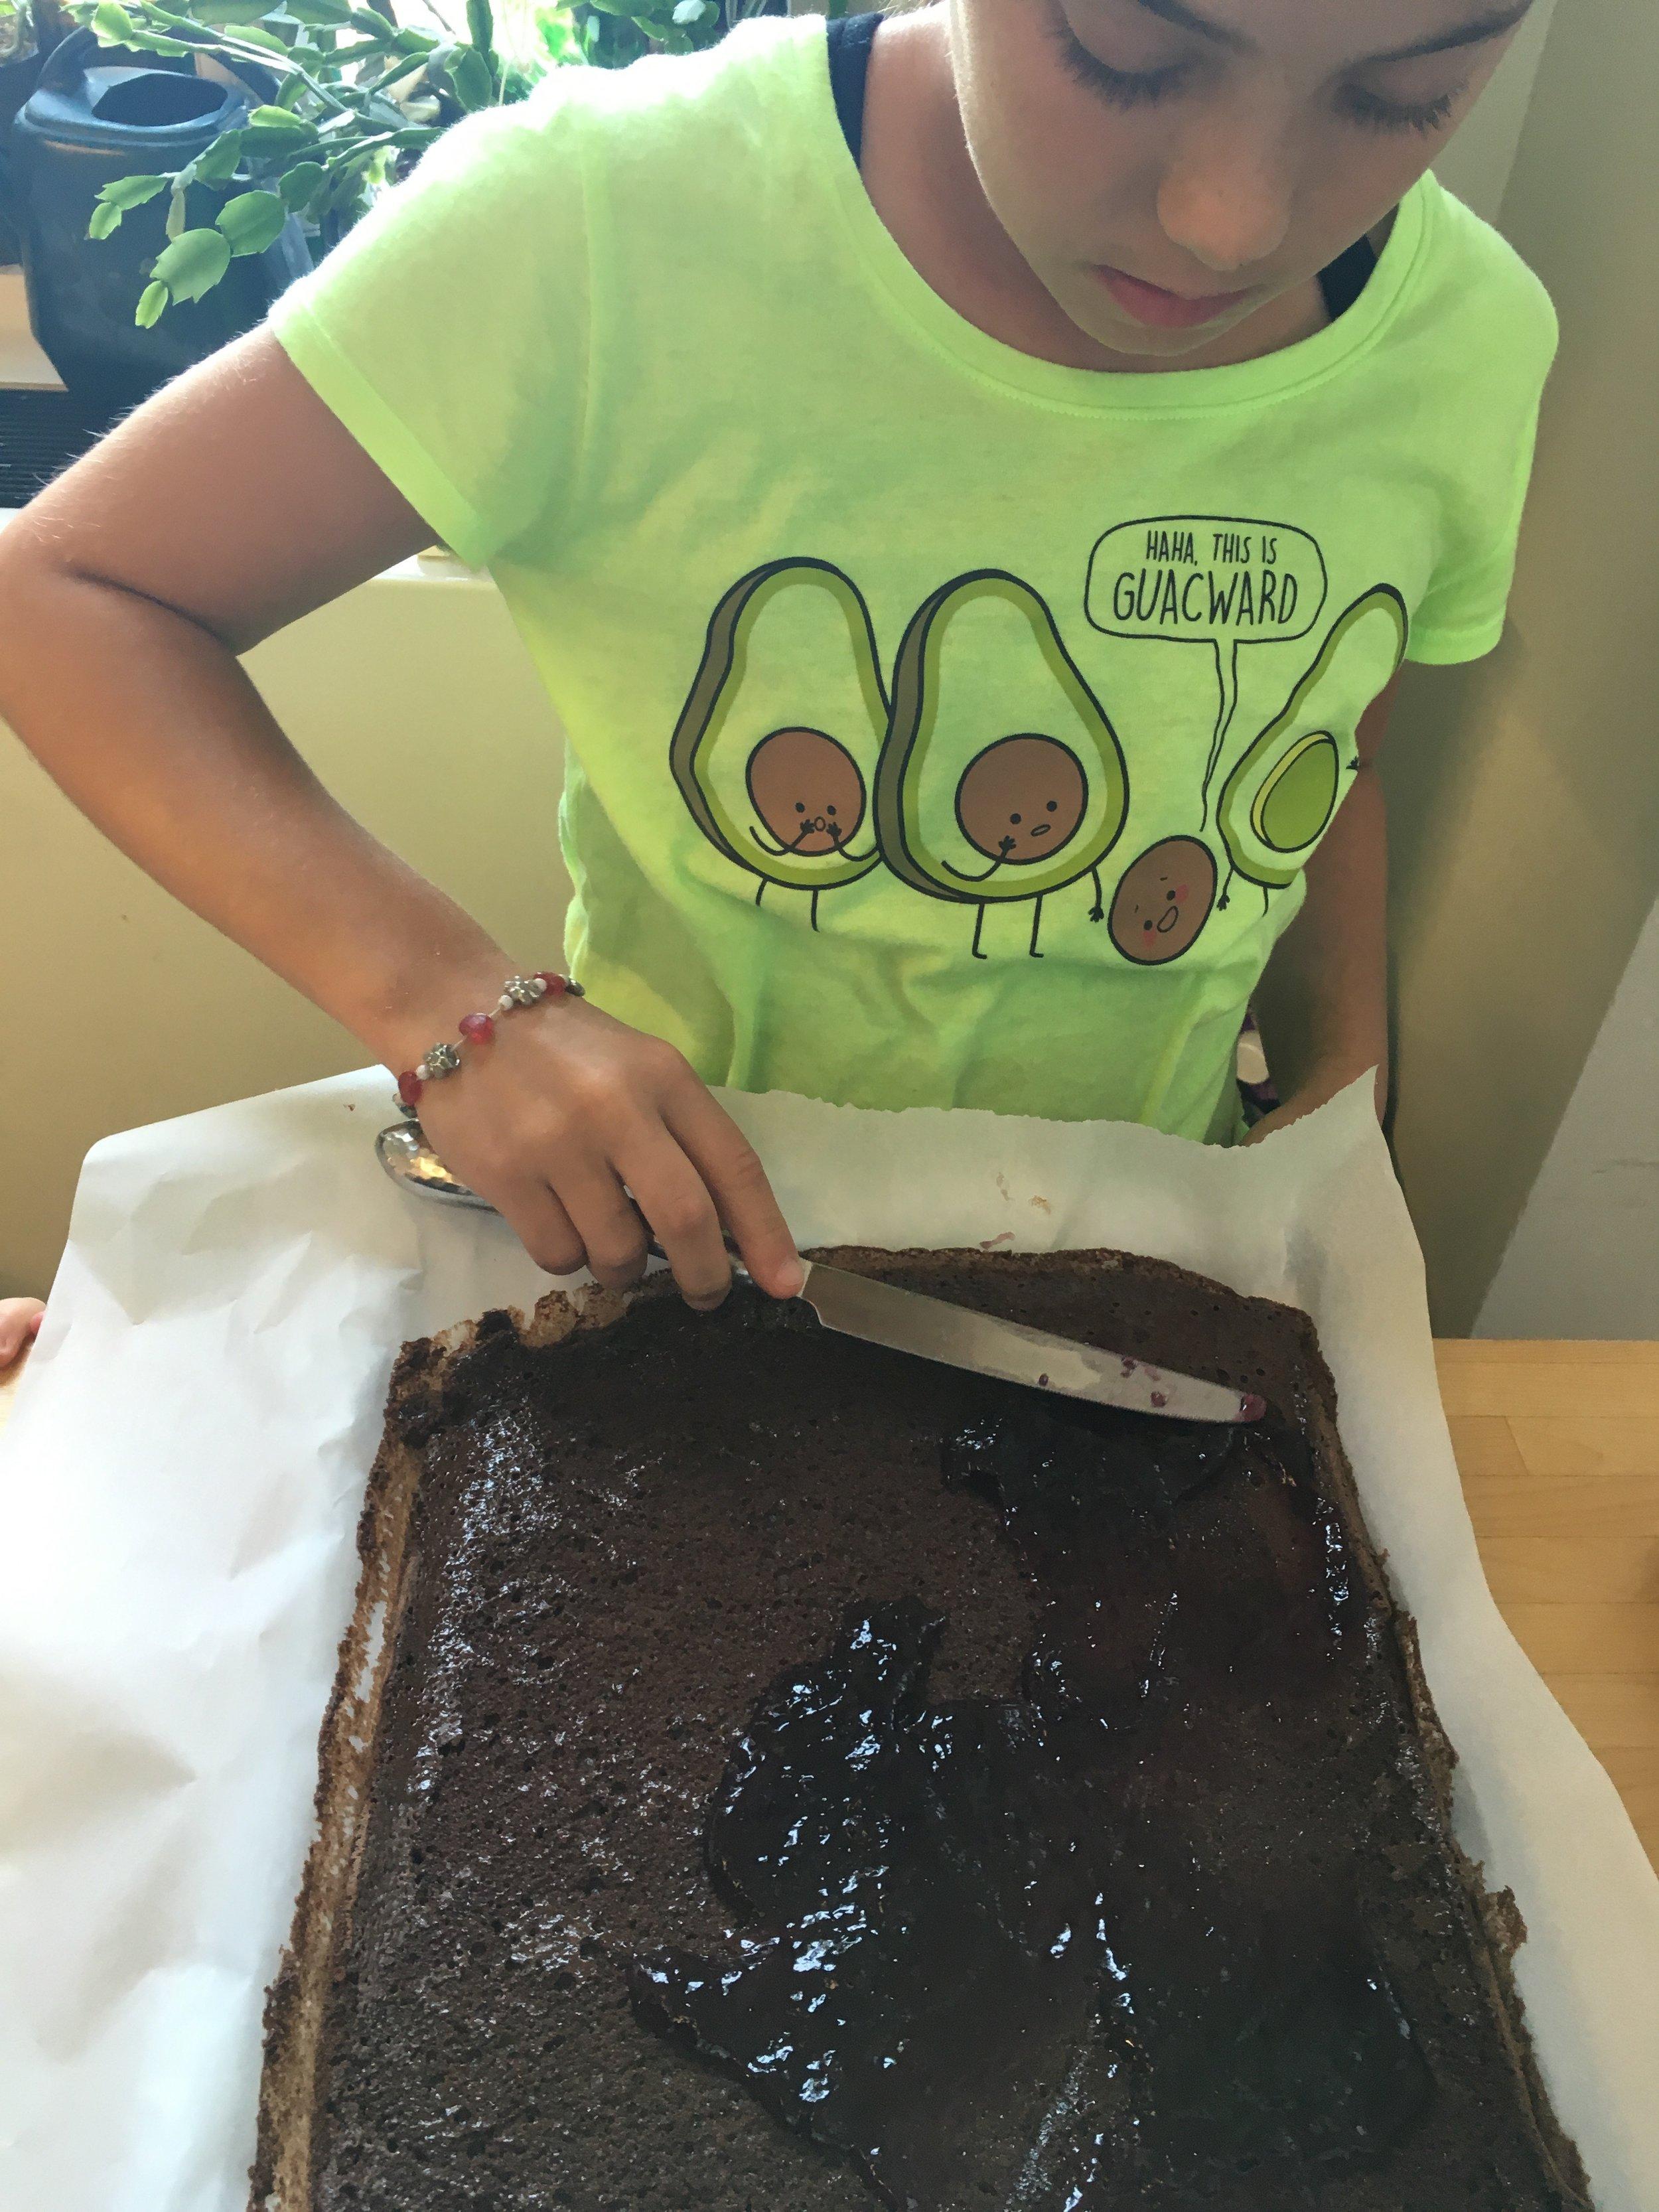 spread jam onto chocolate roll